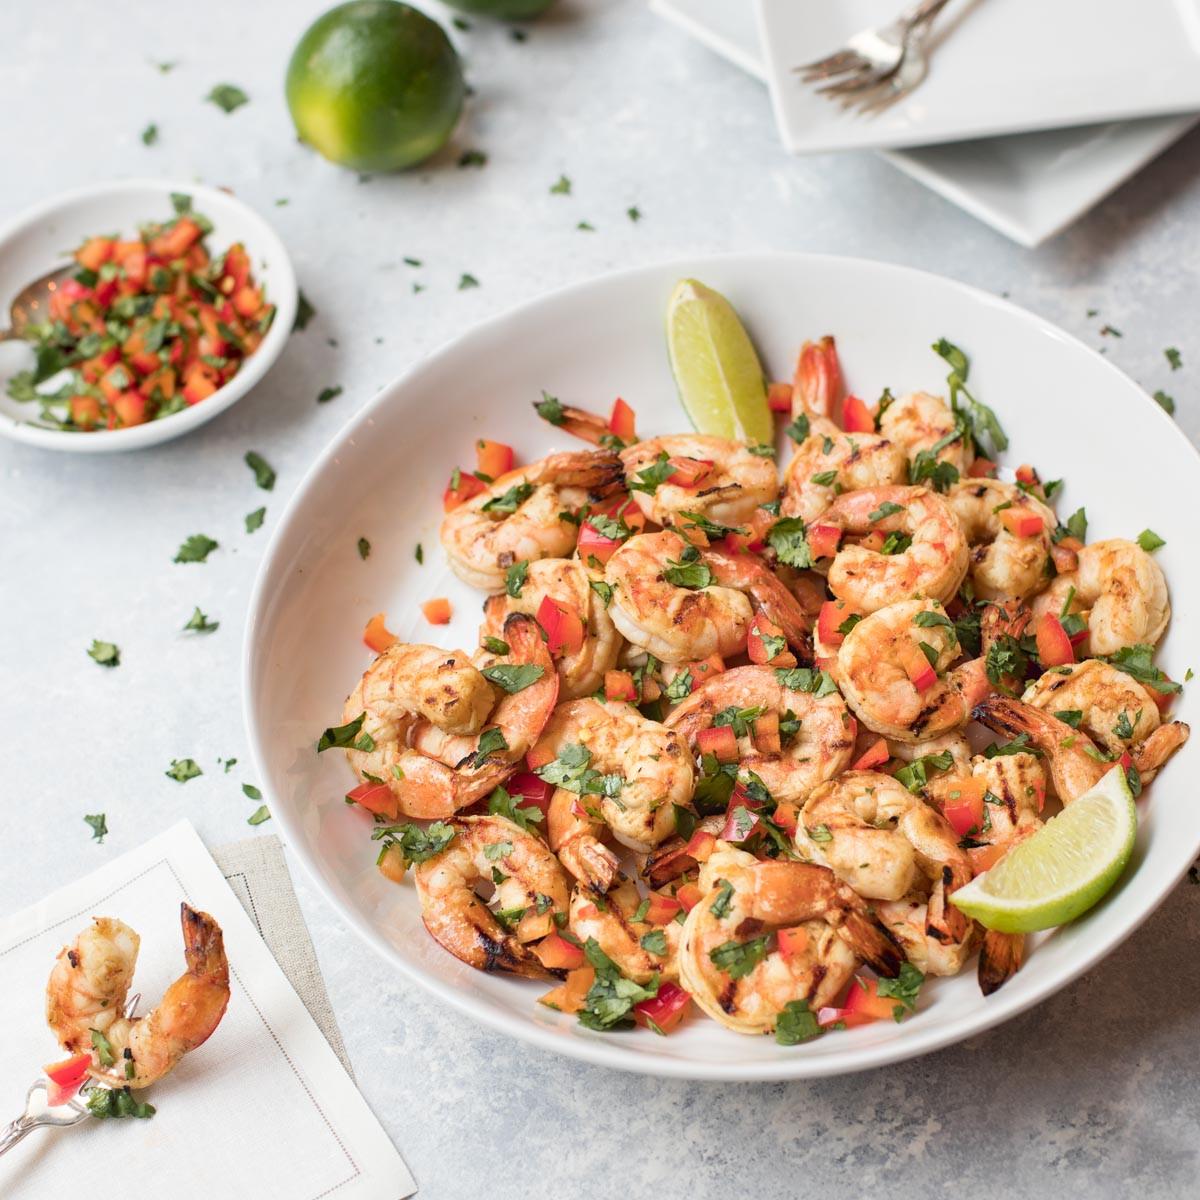 Cold Marinated Shrimp Appetizer  Spicy Southwestern Shrimp Appetizer